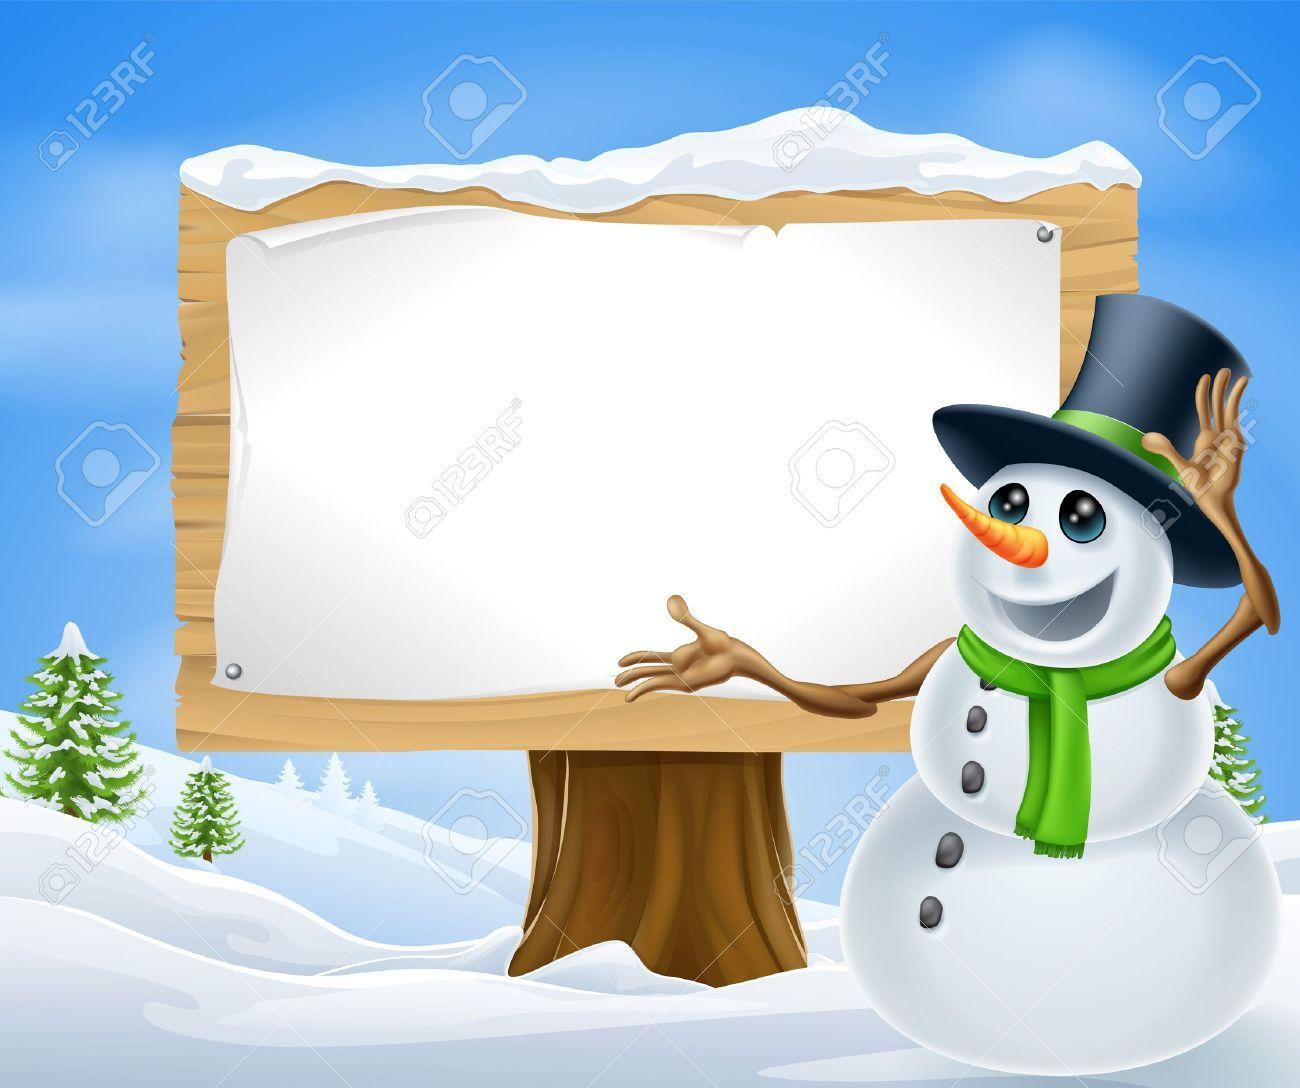 Snowman scene clipart svg black and white library Snowman scene clipart 6 » Clipart Portal svg black and white library